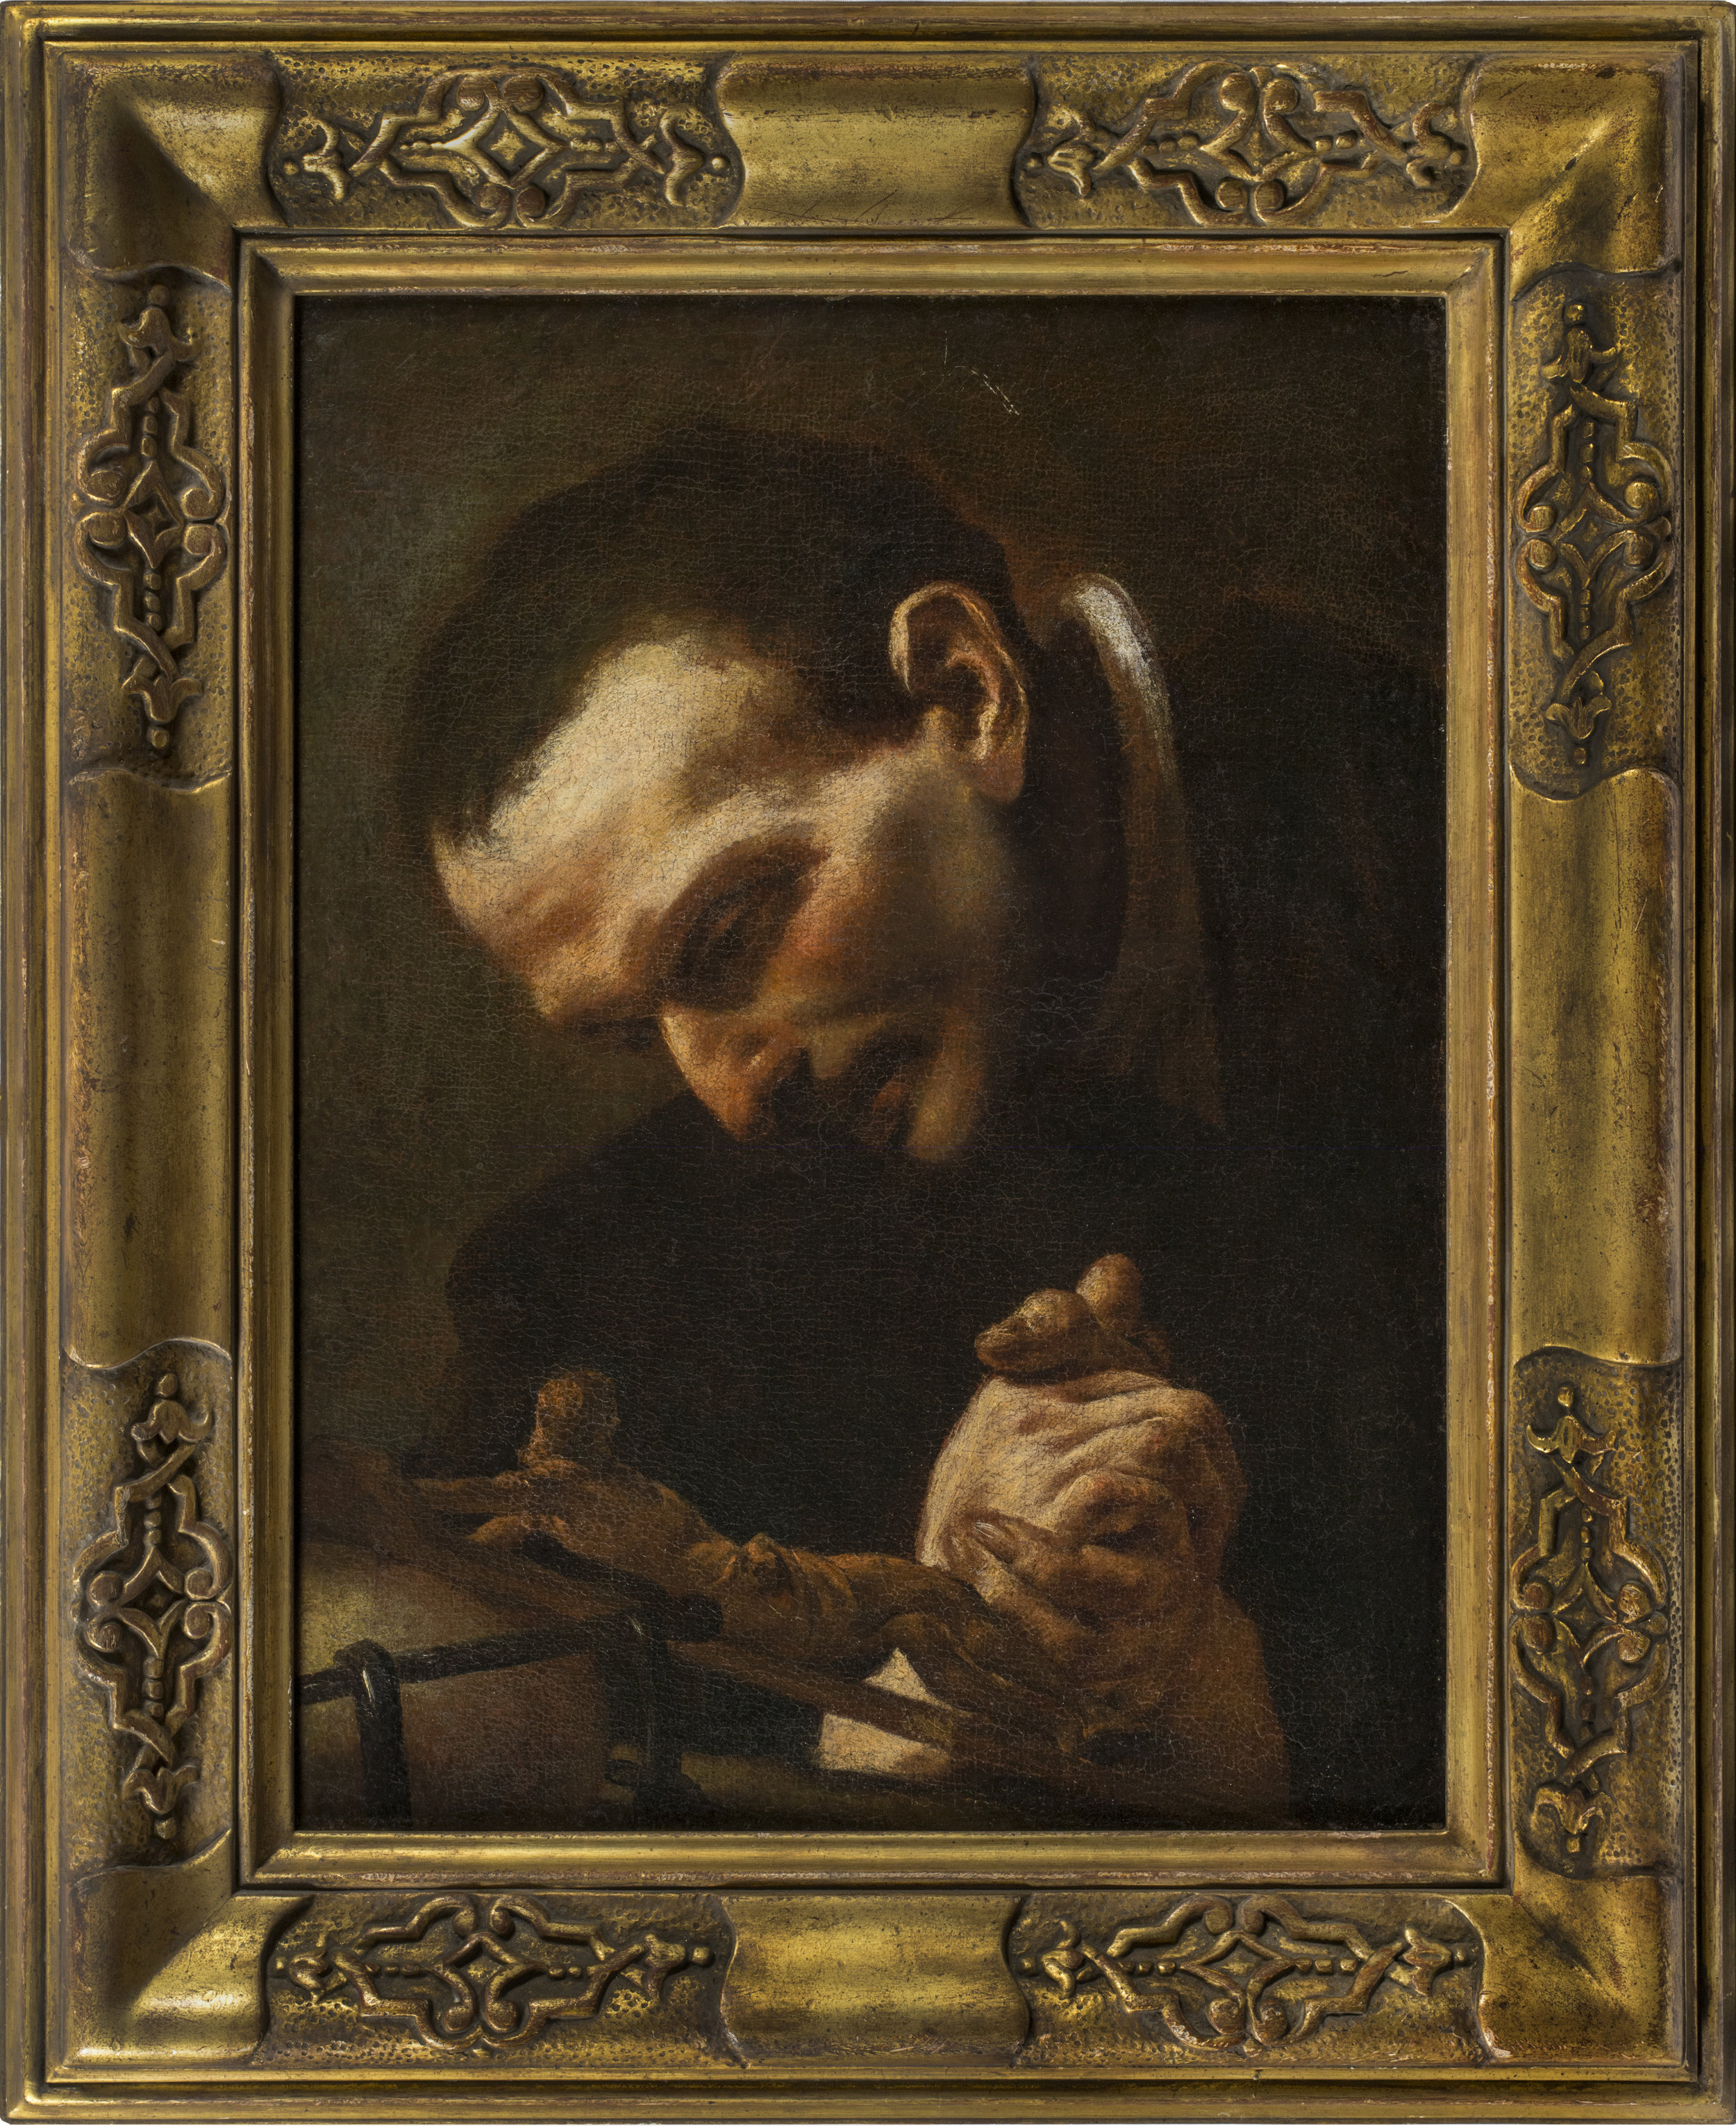 Giovanni Battista Piazzetta,  San Girolamo Miani